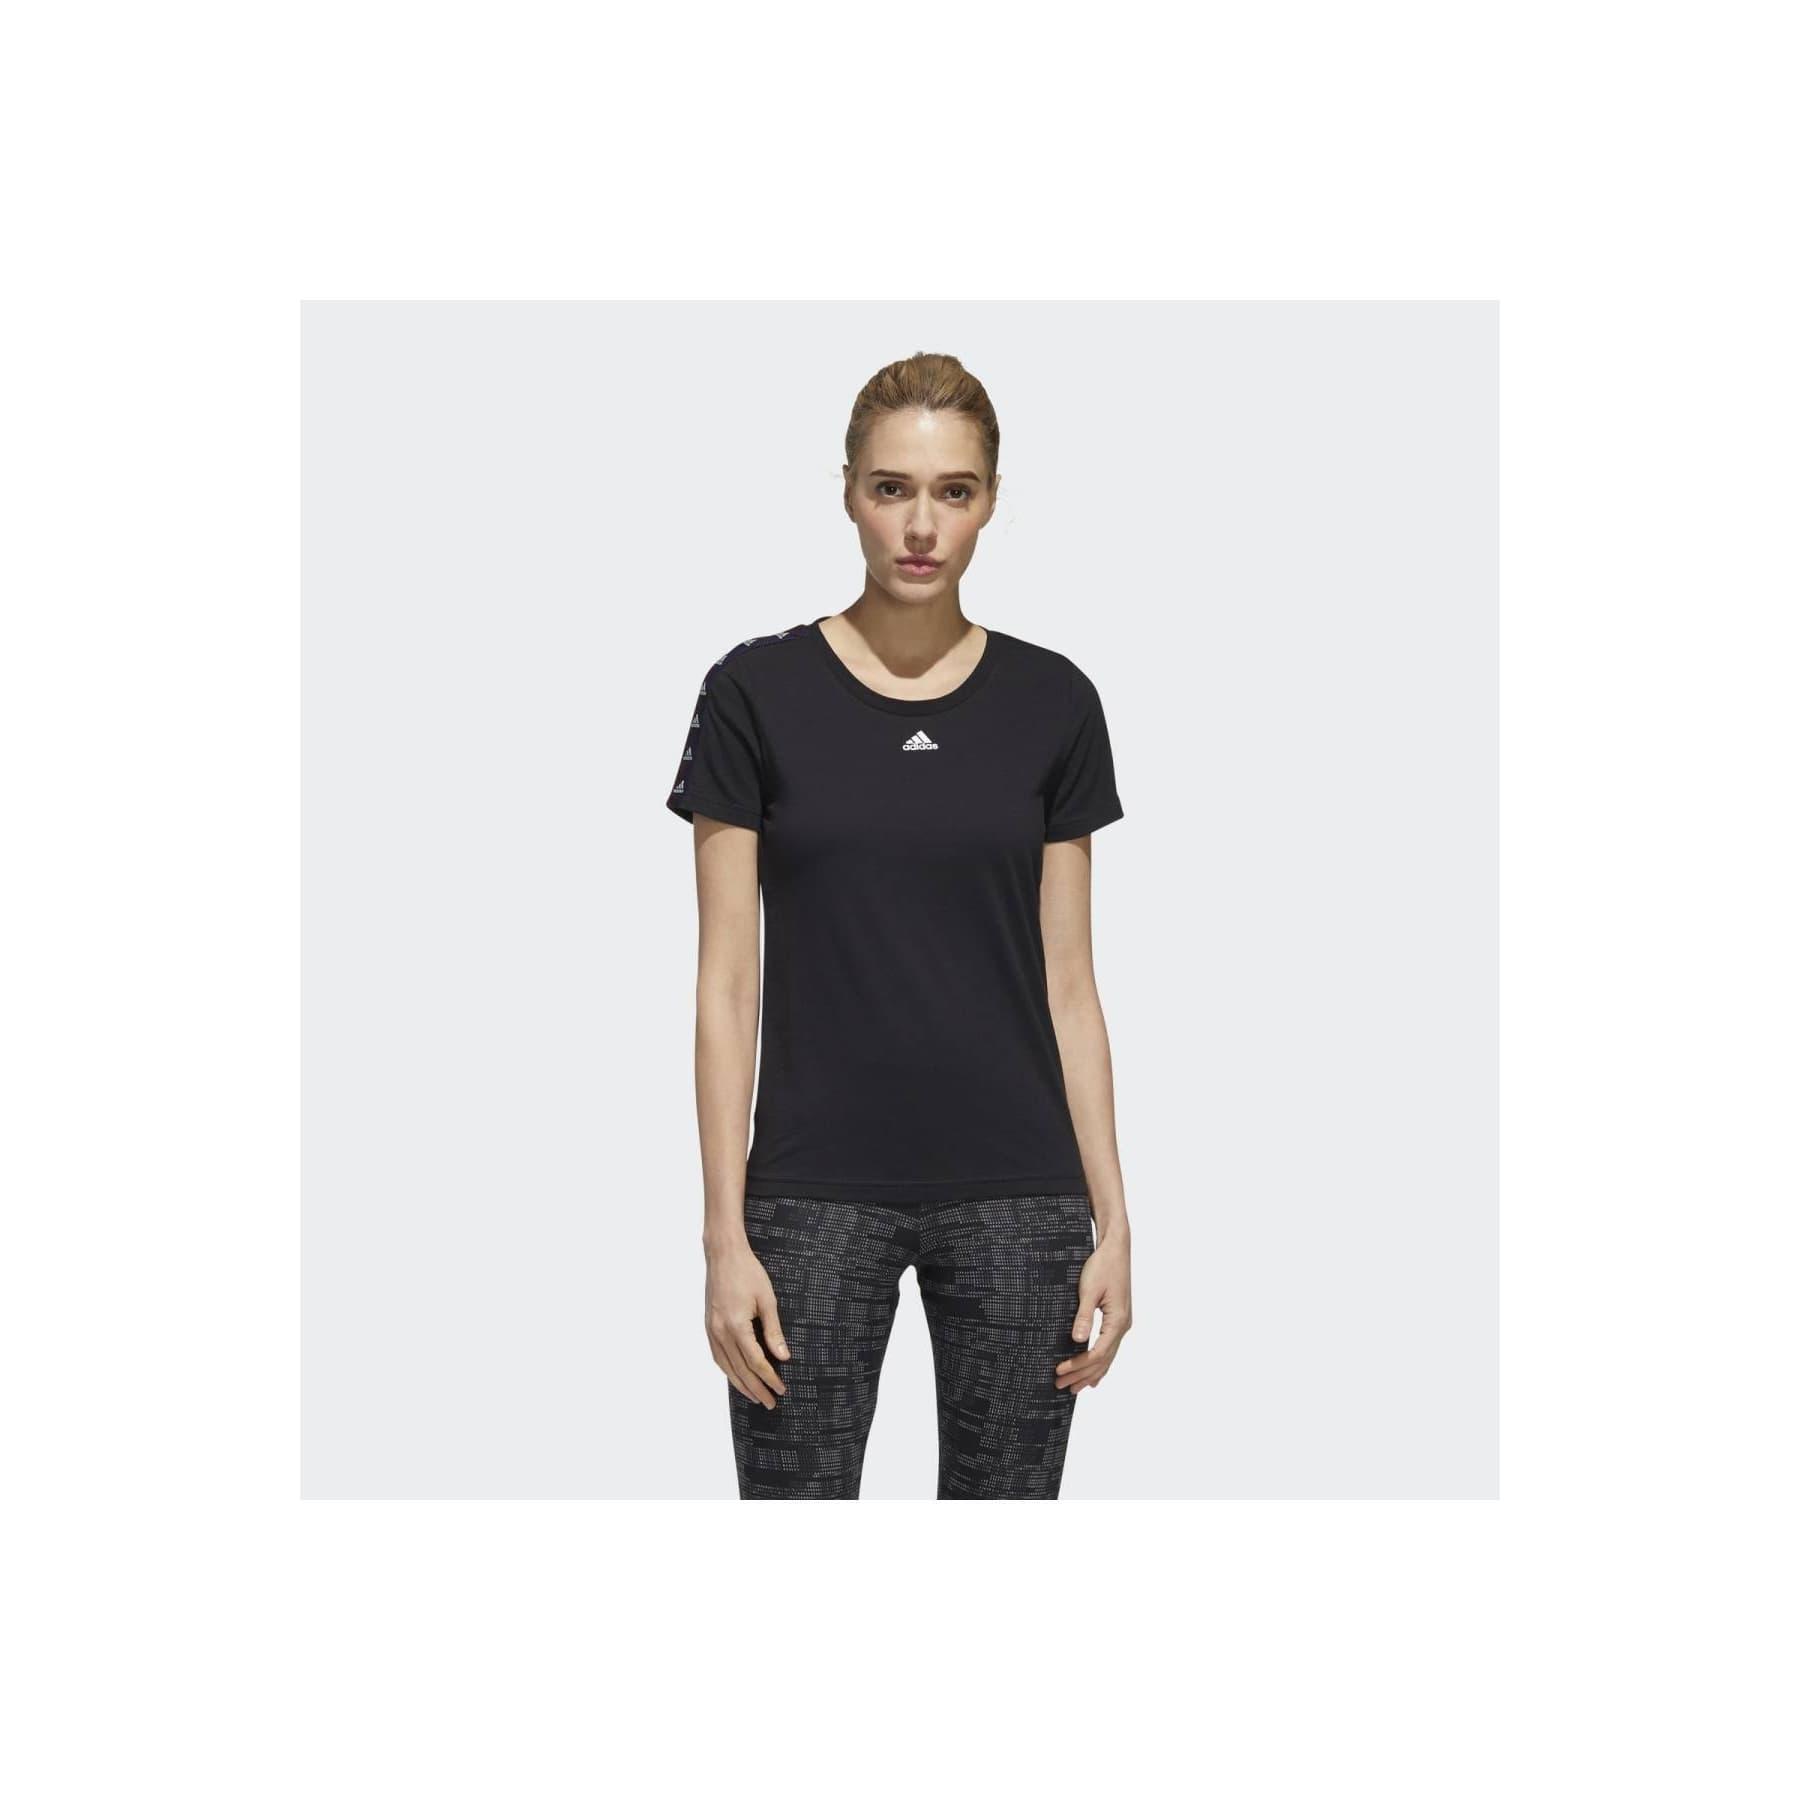 Essentials Tape Kadın Pamuklu Siyah Tişört